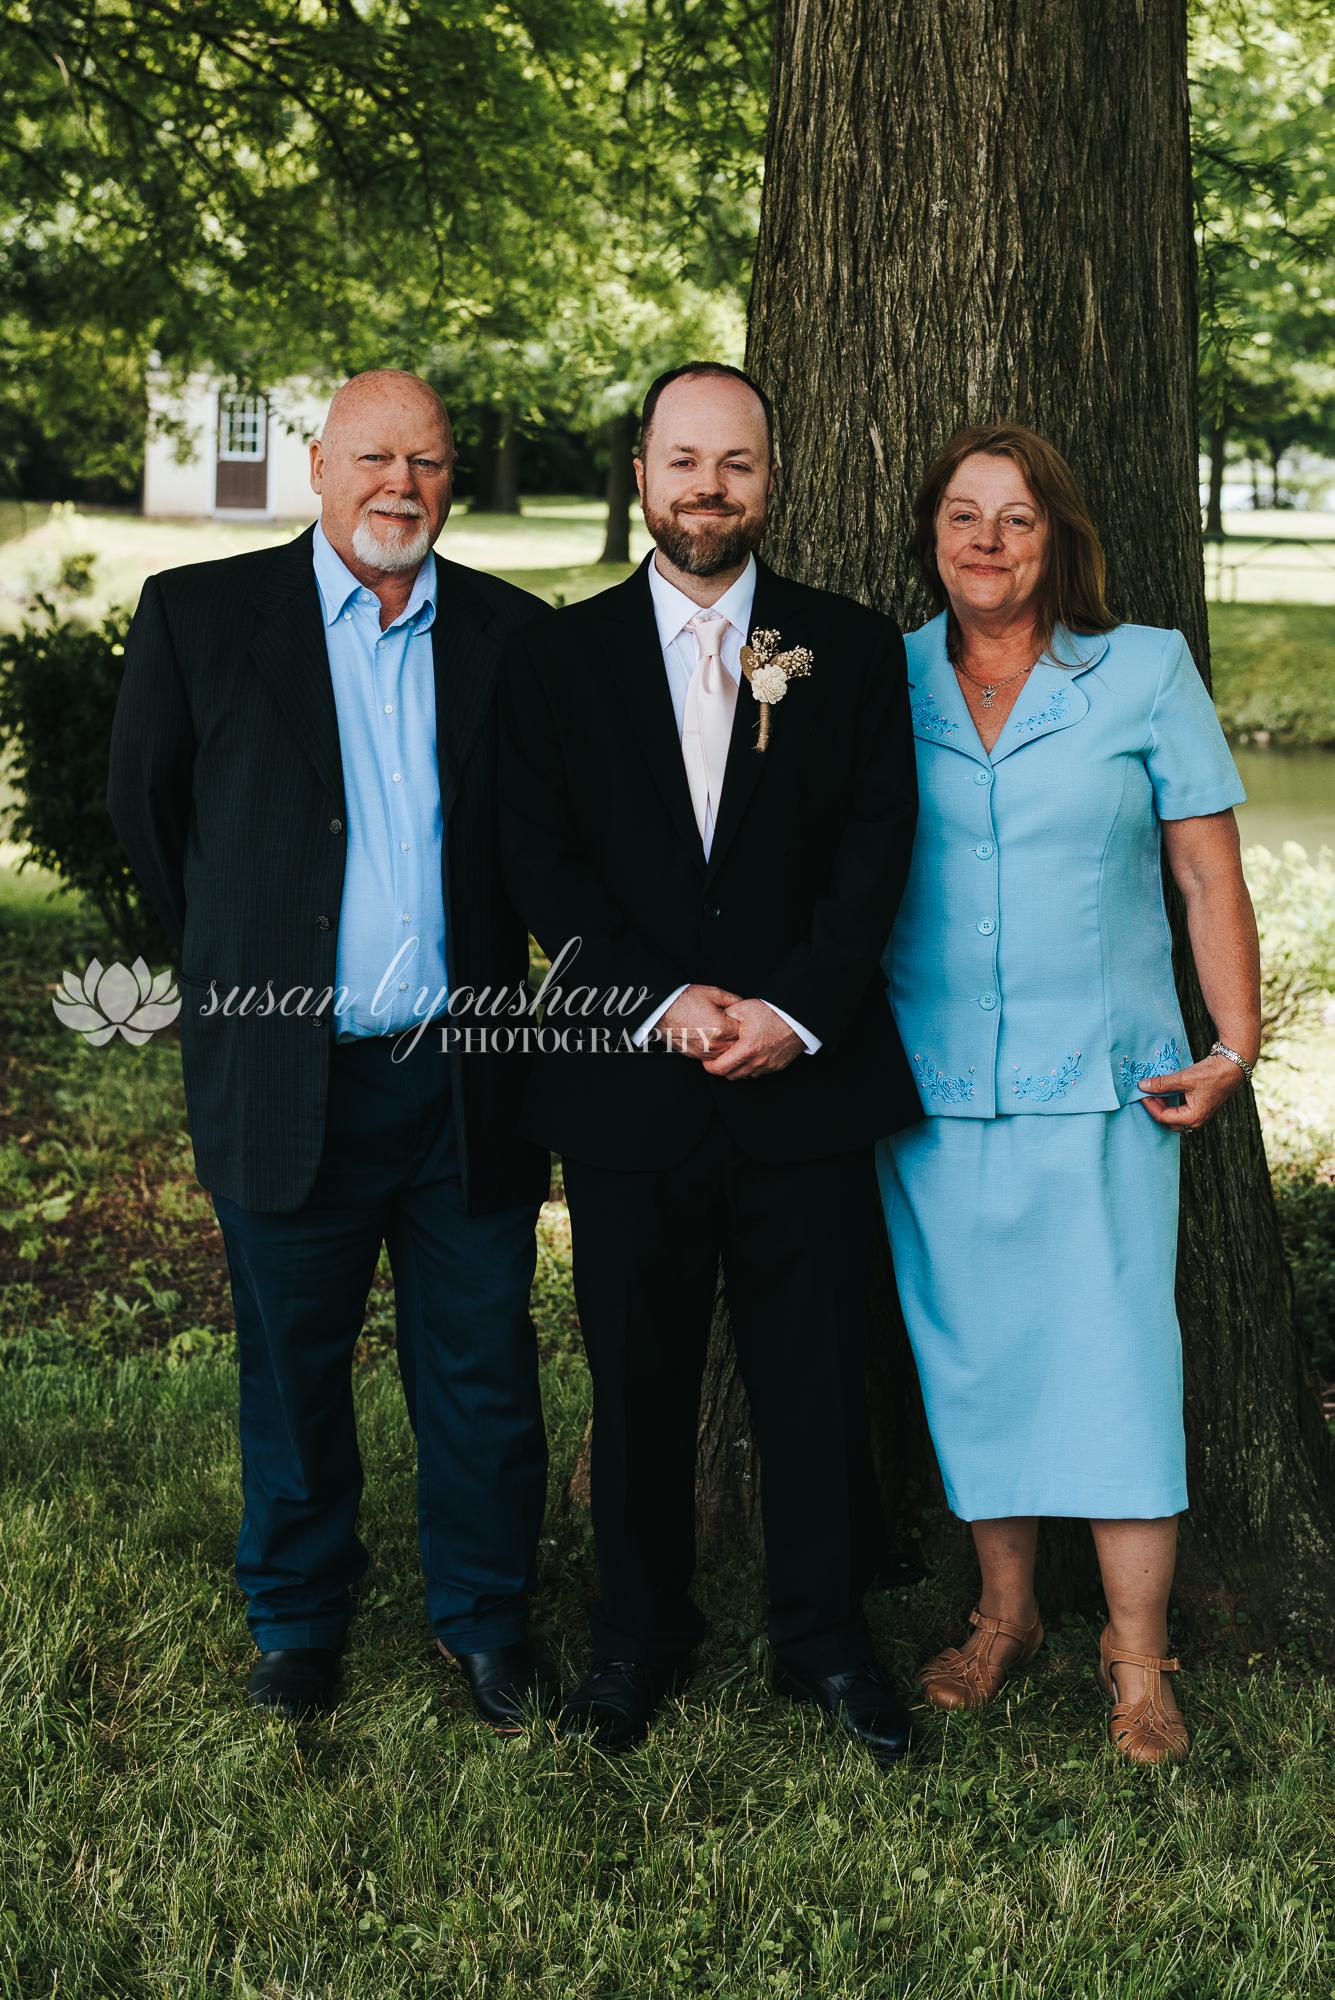 Bill and Sarah Wedding Photos 06-08-2019 SLY Photography -44.jpg